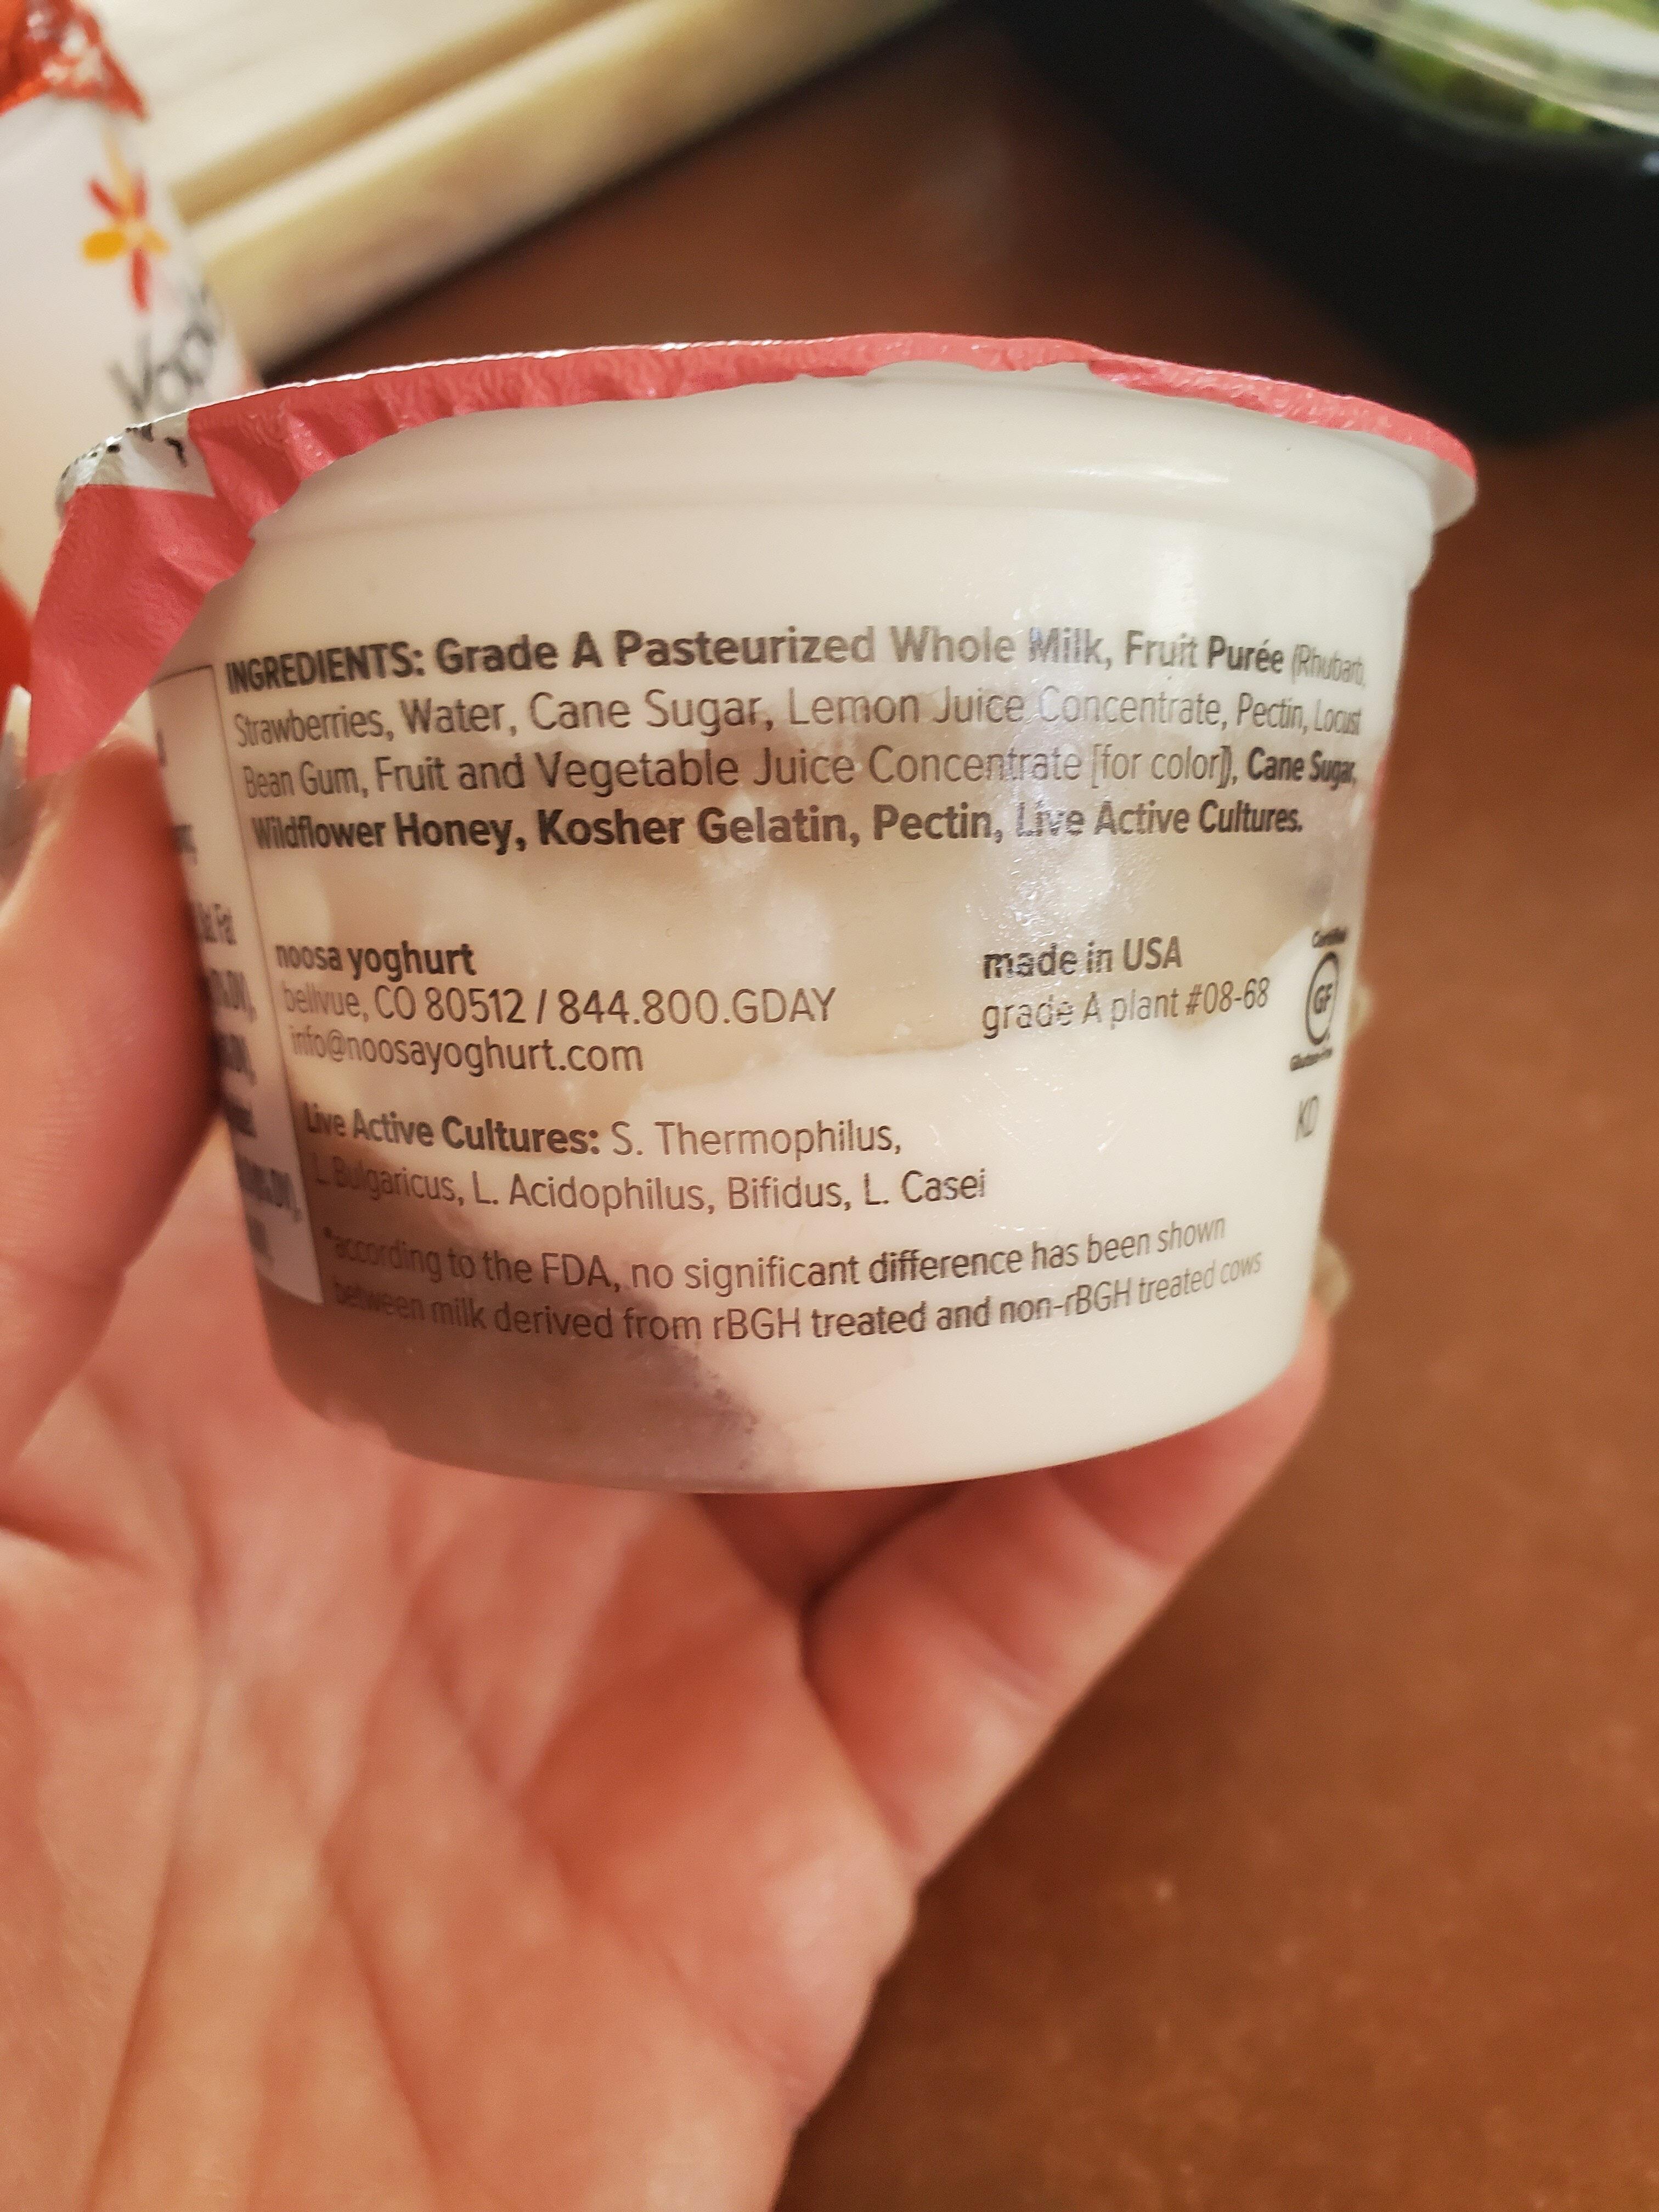 Finest yoghurt Strawberry rhubarb - Ingredientes - en